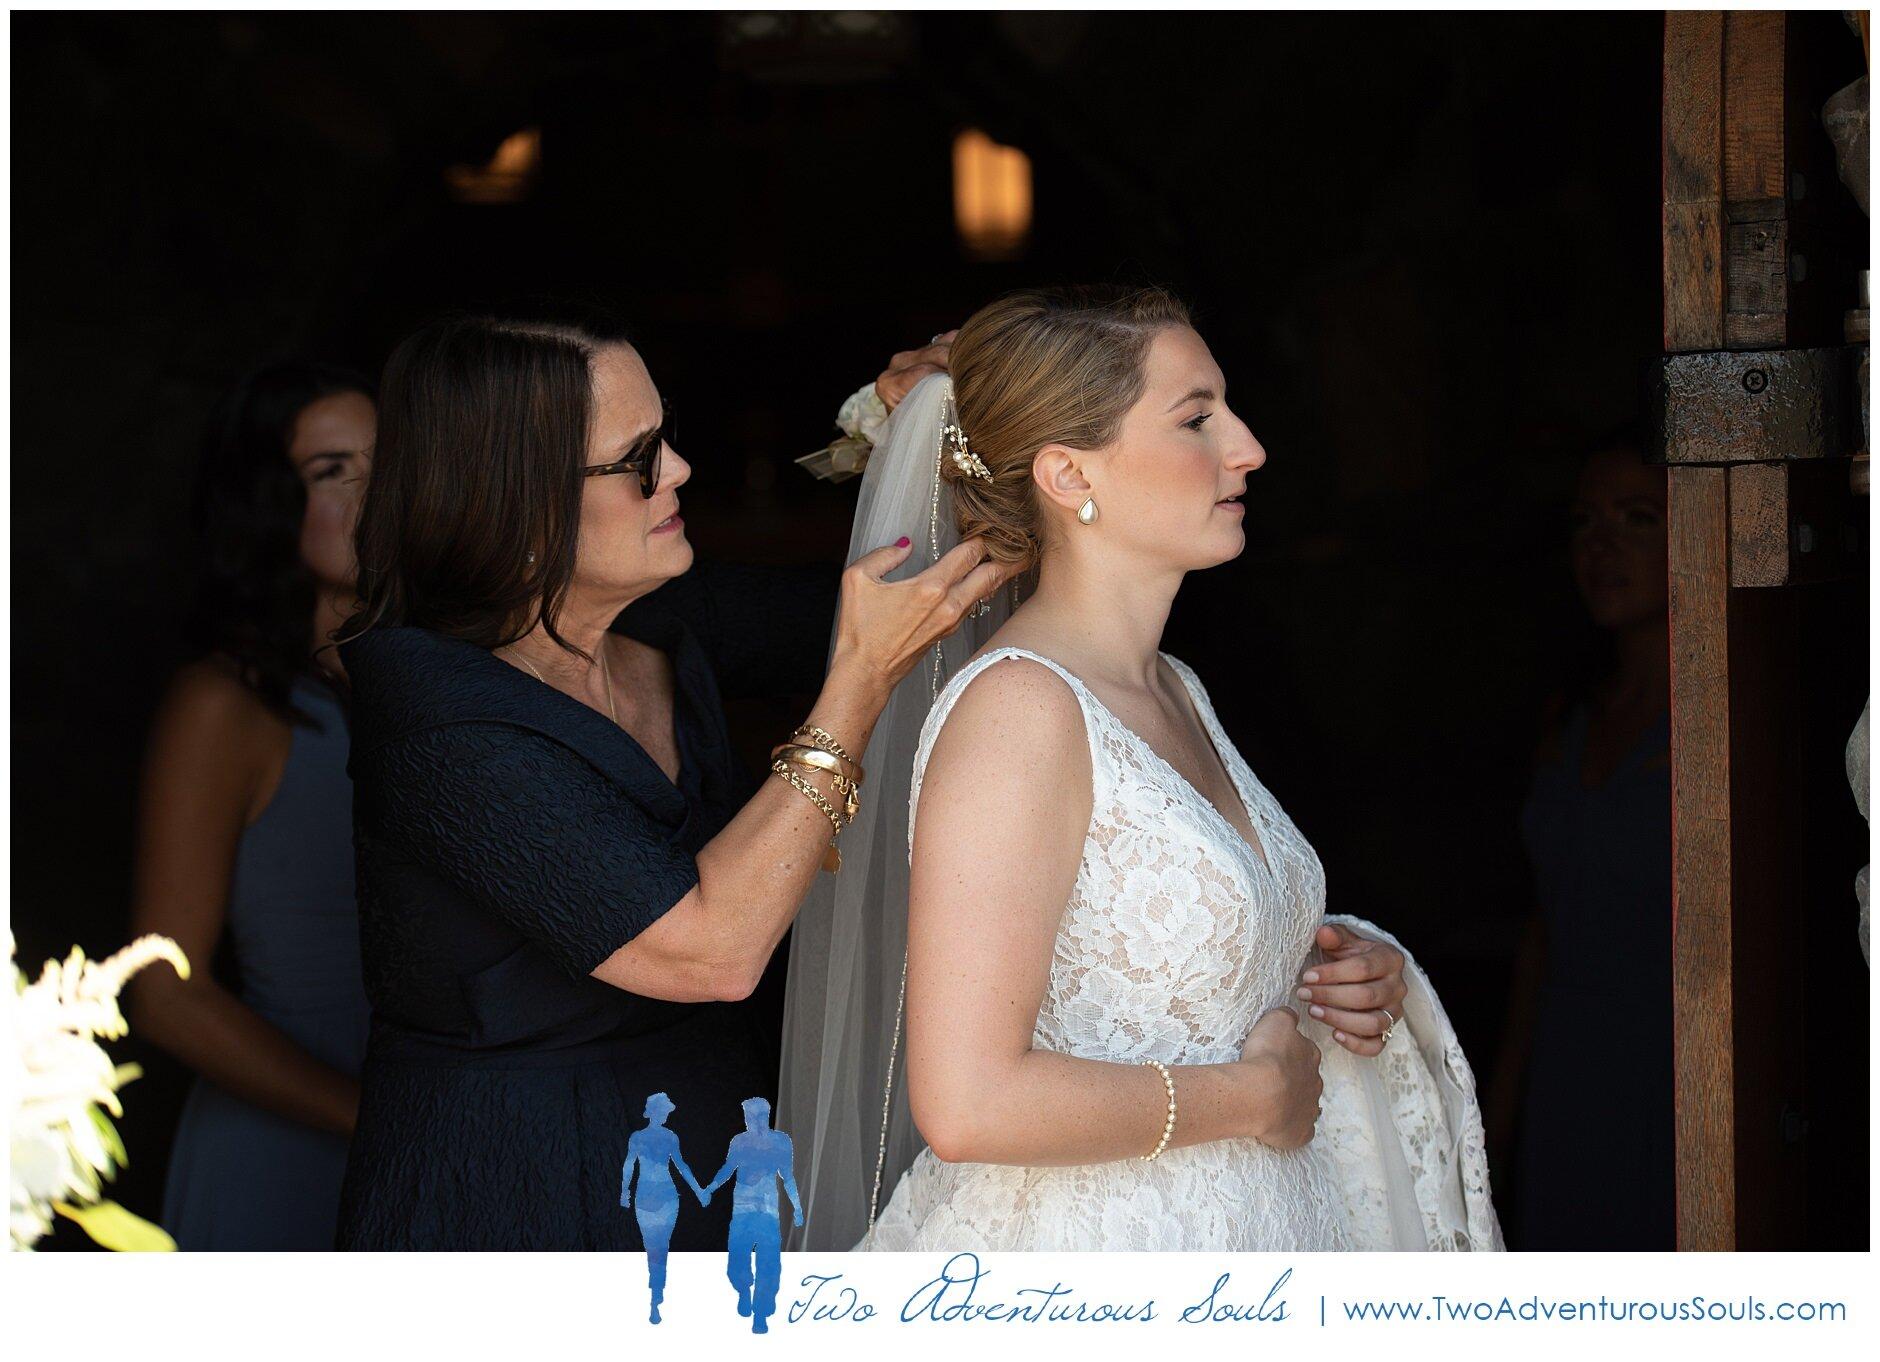 Breakwater Inn and Spa Wedding Photographers, Kennebunkport Wedding Photographers, Two Adventurous Souls- 092119_0020.jpg